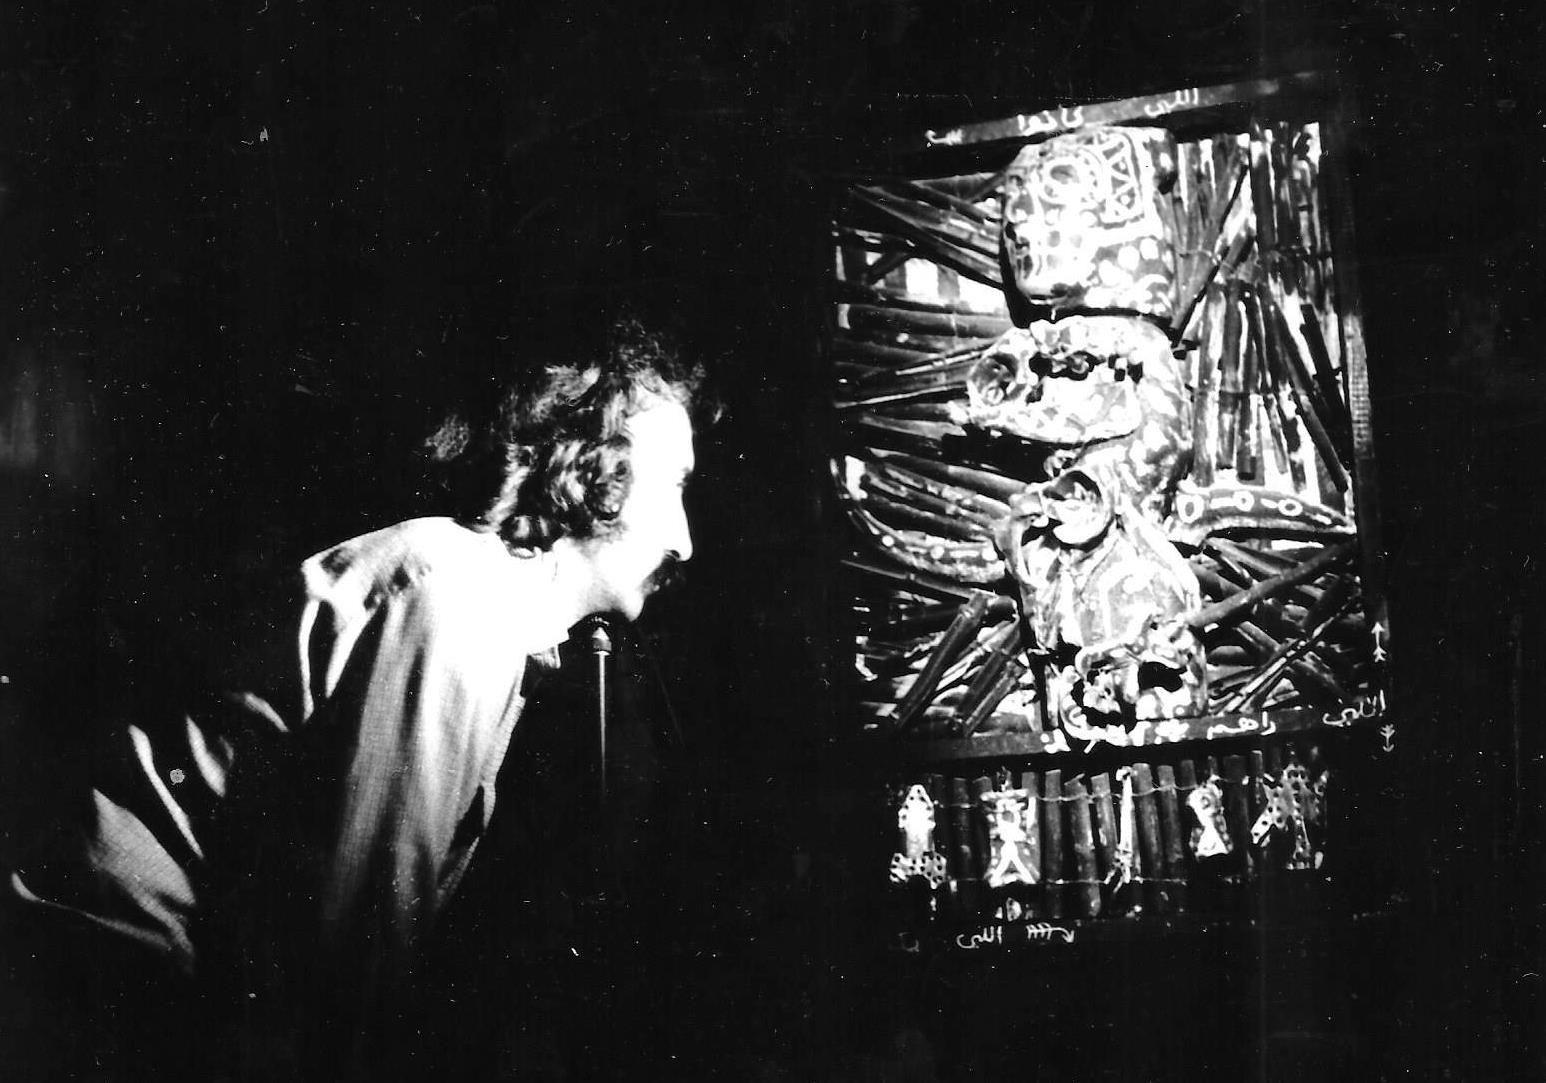 JP-Lledo---Tournage-2-films-l'Oeuvre-et-le-Peintre-Denis-Martinez,-1984,-Blida,-